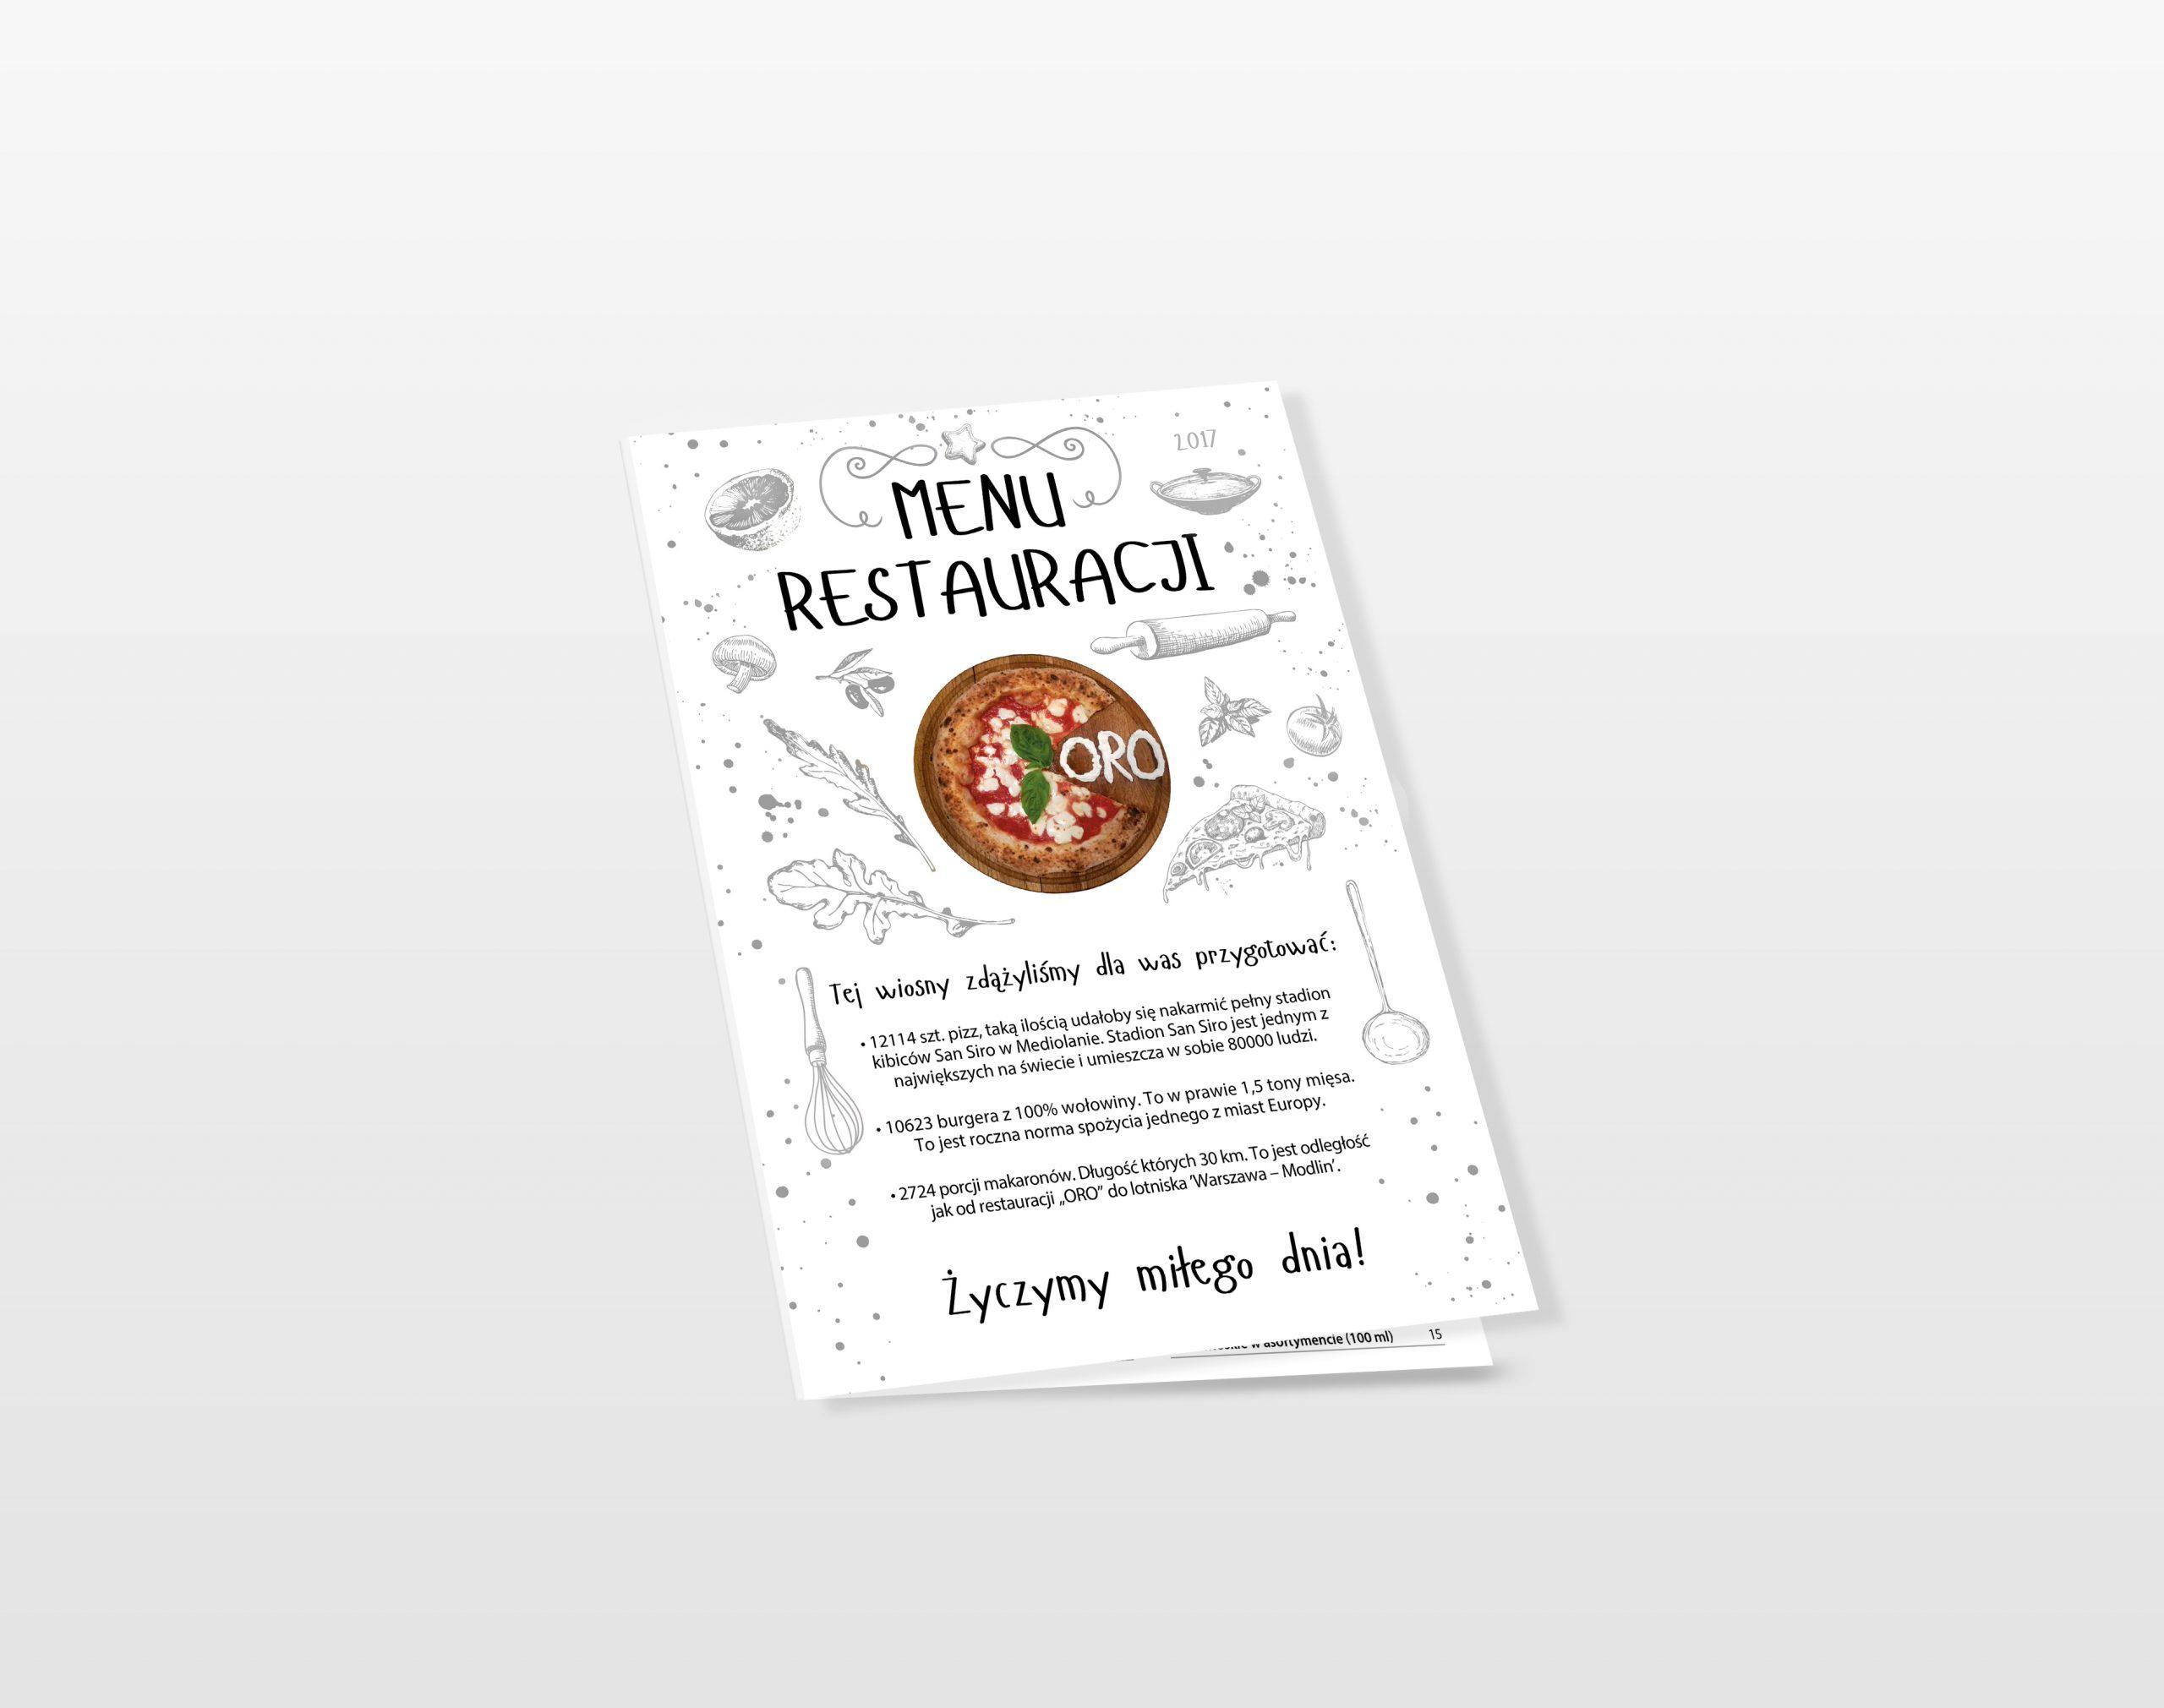 ORO menu 4